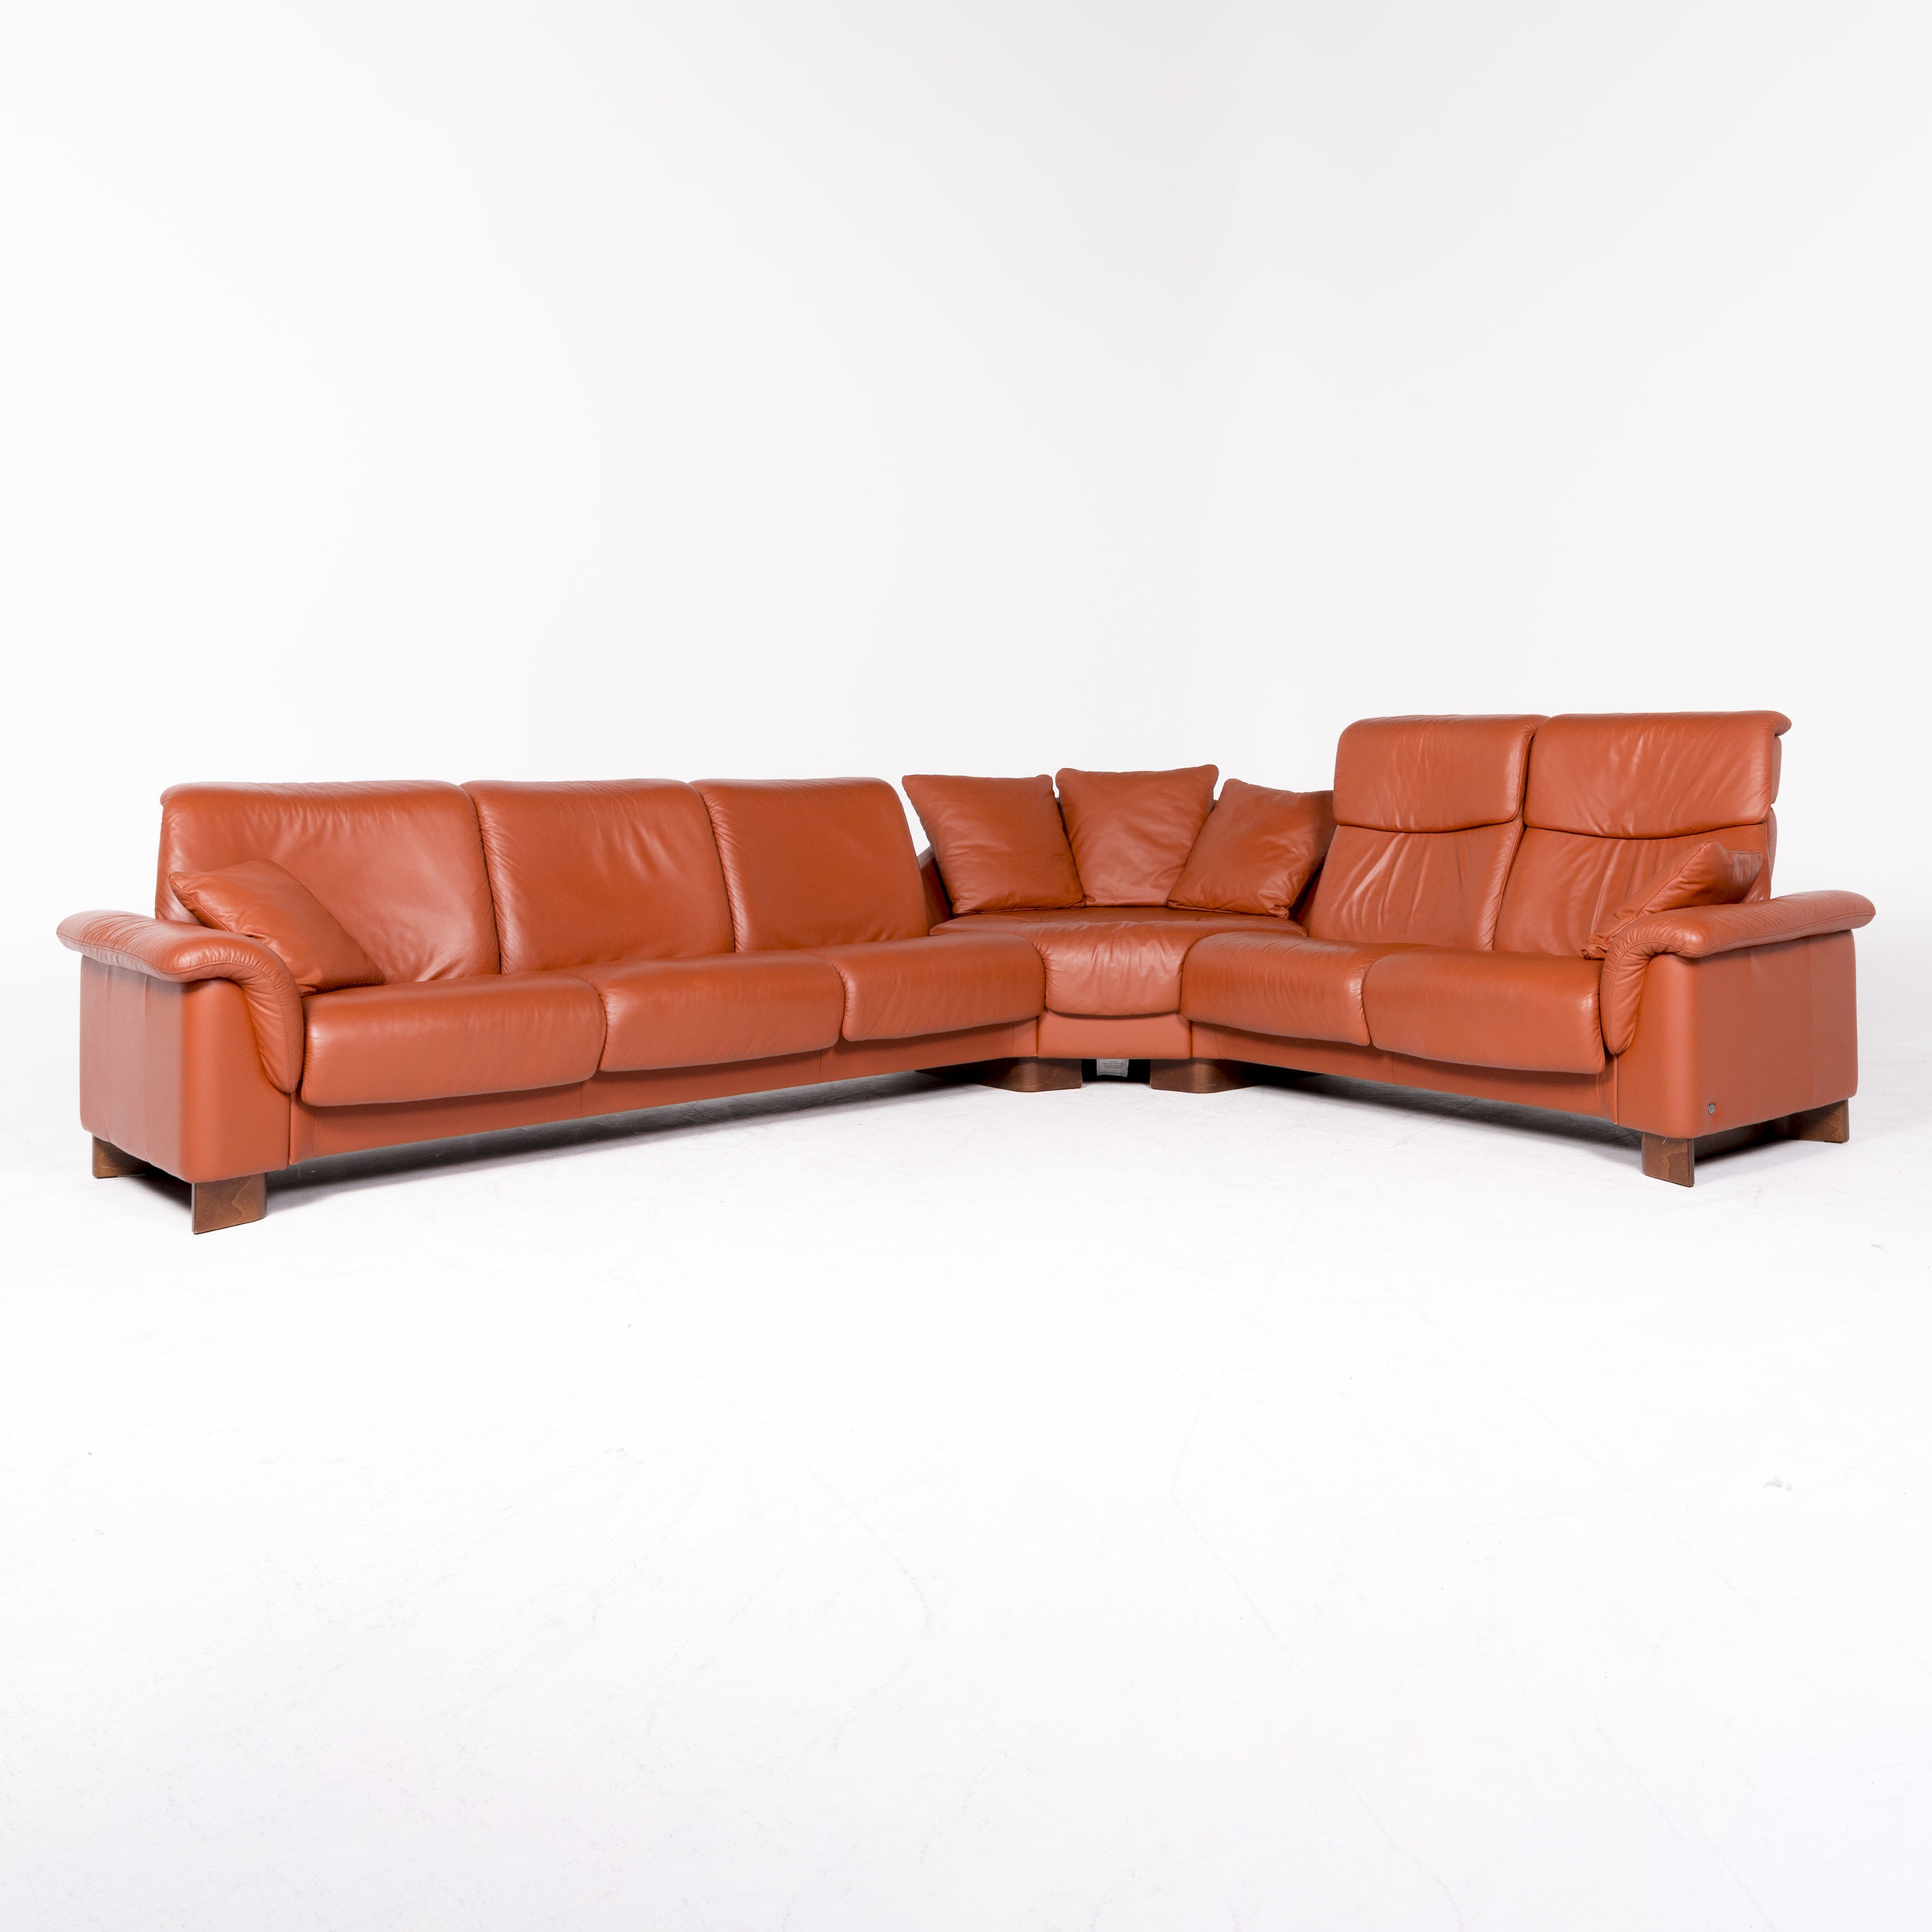 Stressless Eldorado Designer Leather Corner Sofa Orange Terracotta Real Leather Sofa Couch 8655 Real Leather Sofas Corner Sofa Orange Leather Sofa Couch